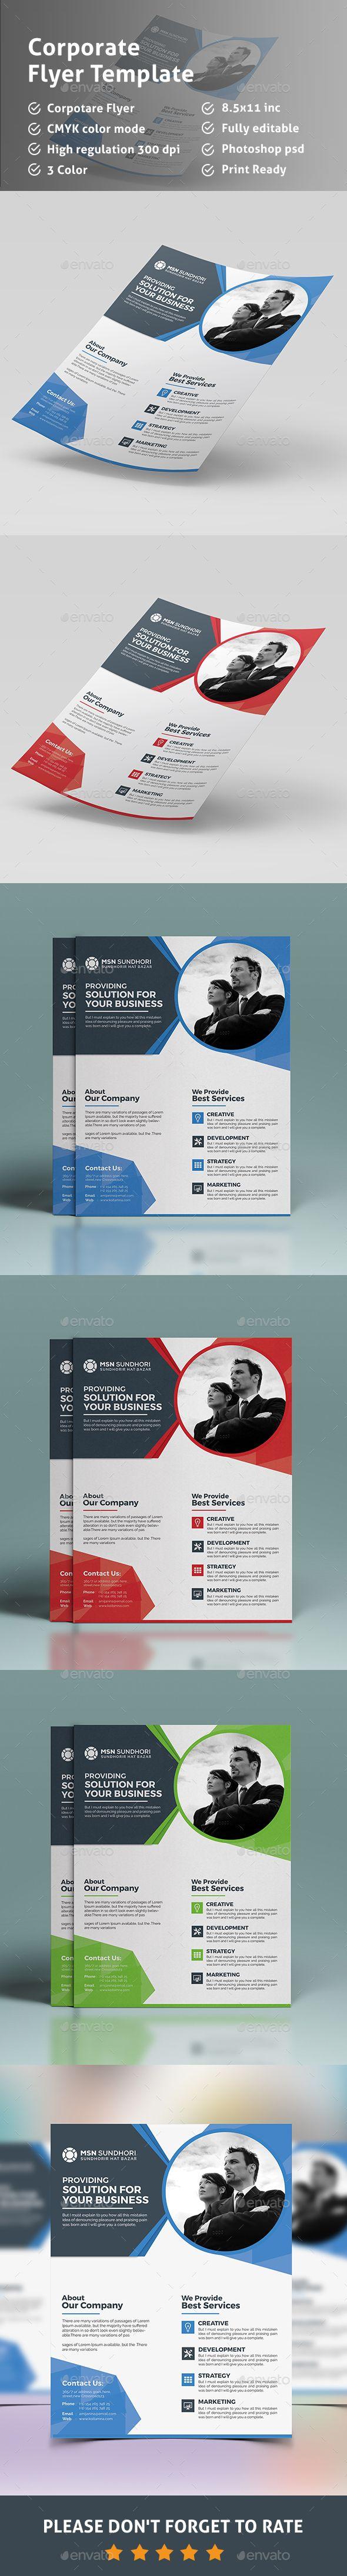 Flyer Template PSD. Download here: http://graphicriver.net/item/flyer-/15518058?ref=ksioks